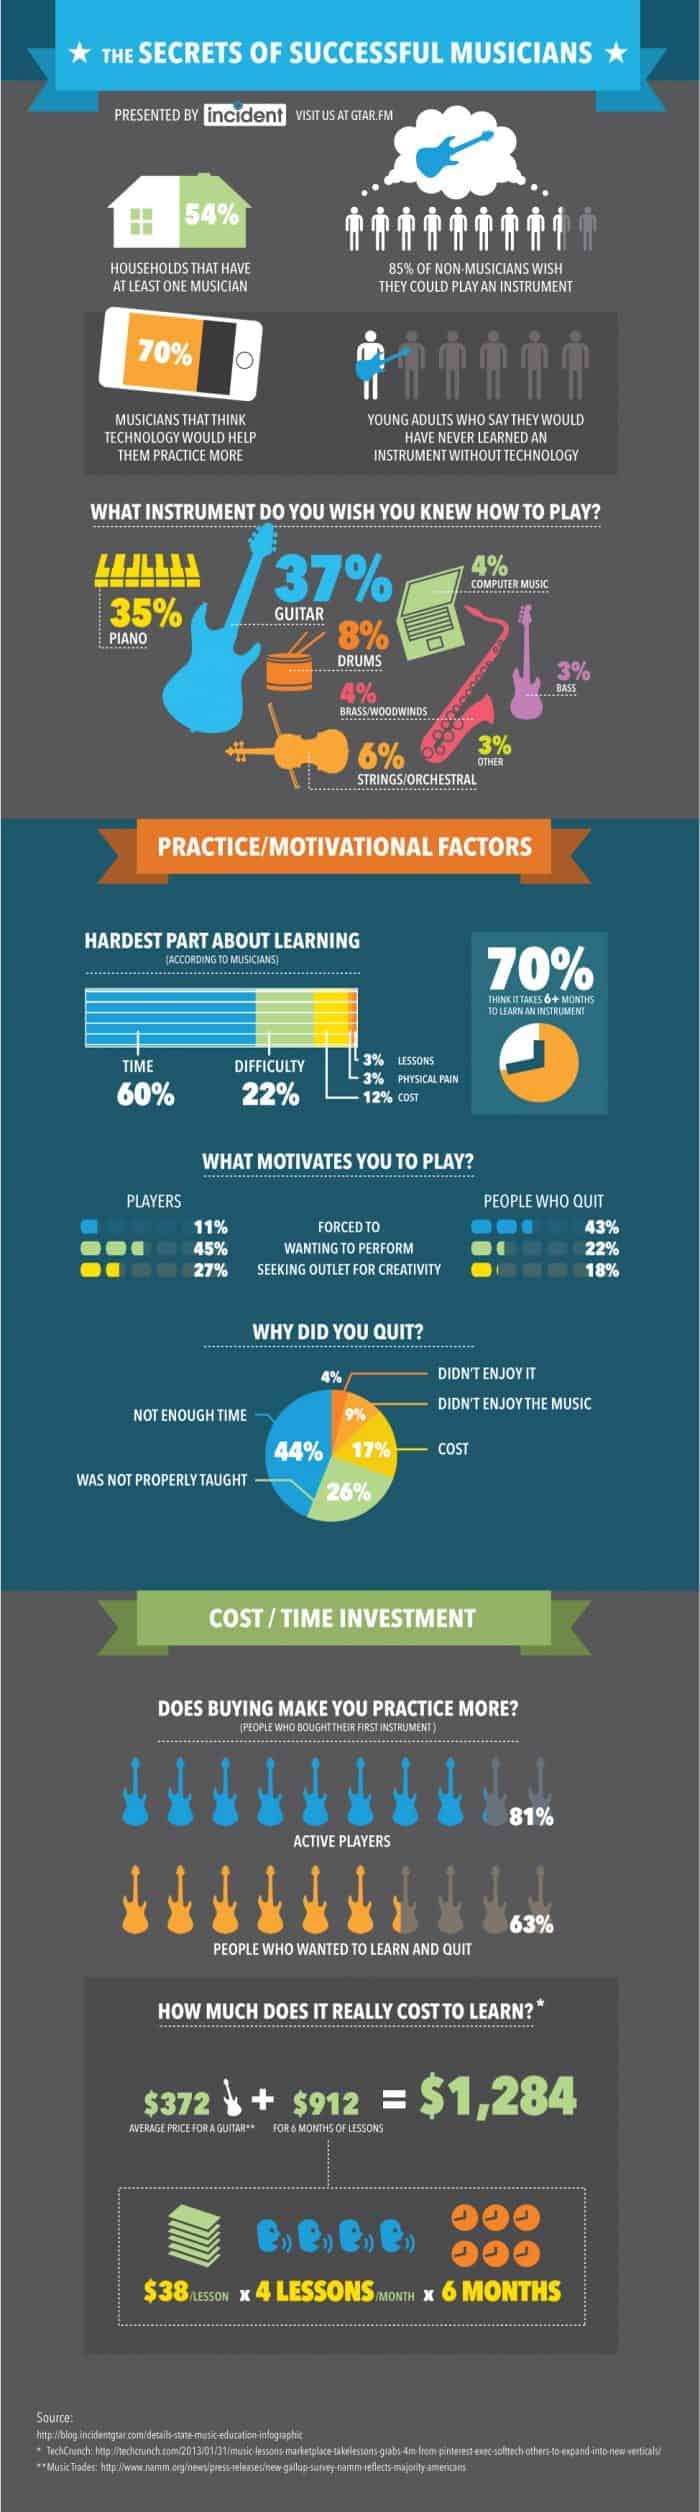 Secrets of successful musicians infographic